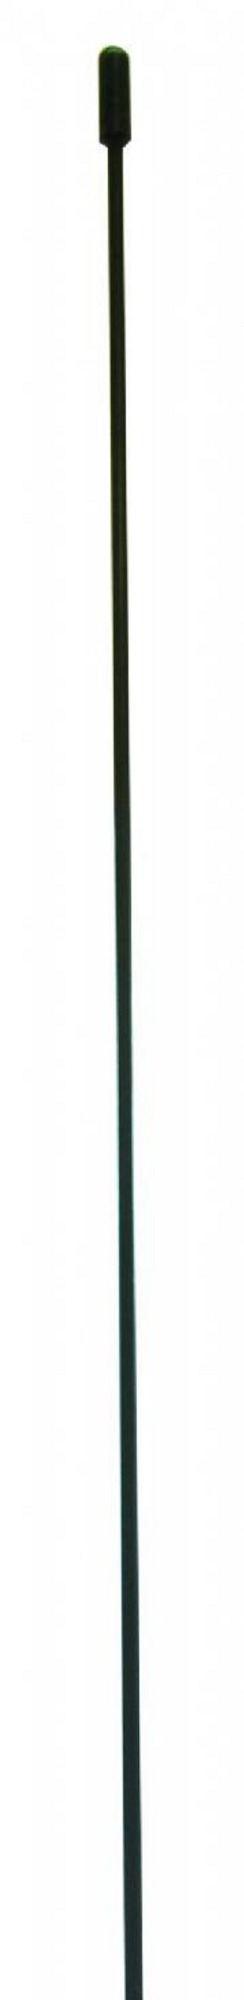 PANORAMA SAR-1220B S/STL PARALLEL ROD BLACK